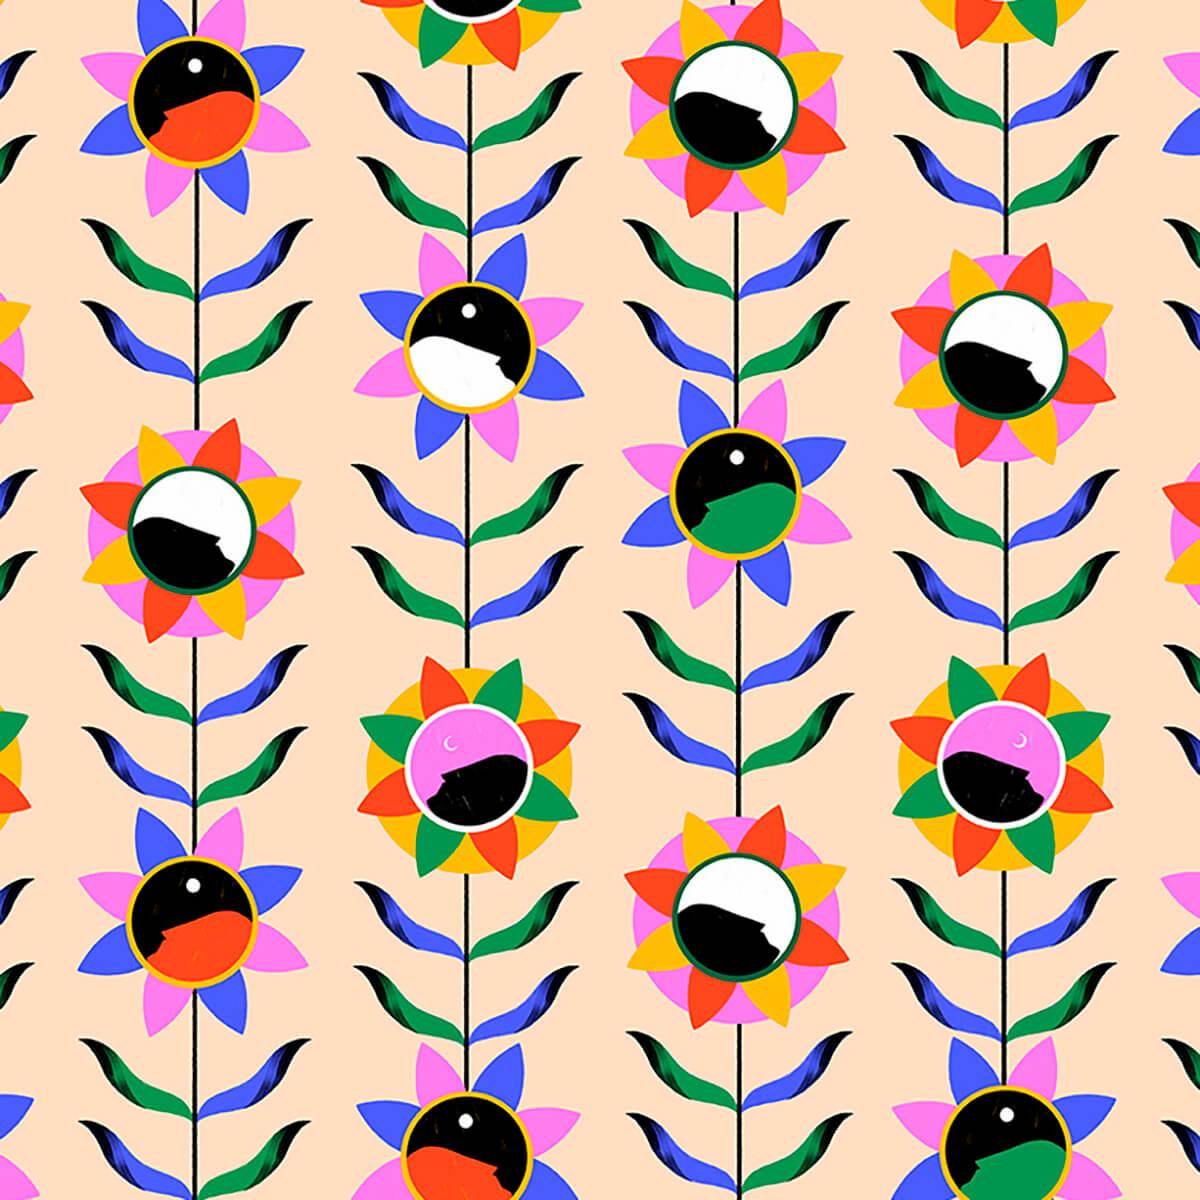 Papel de parede pequeno jardim | Willian Santiago